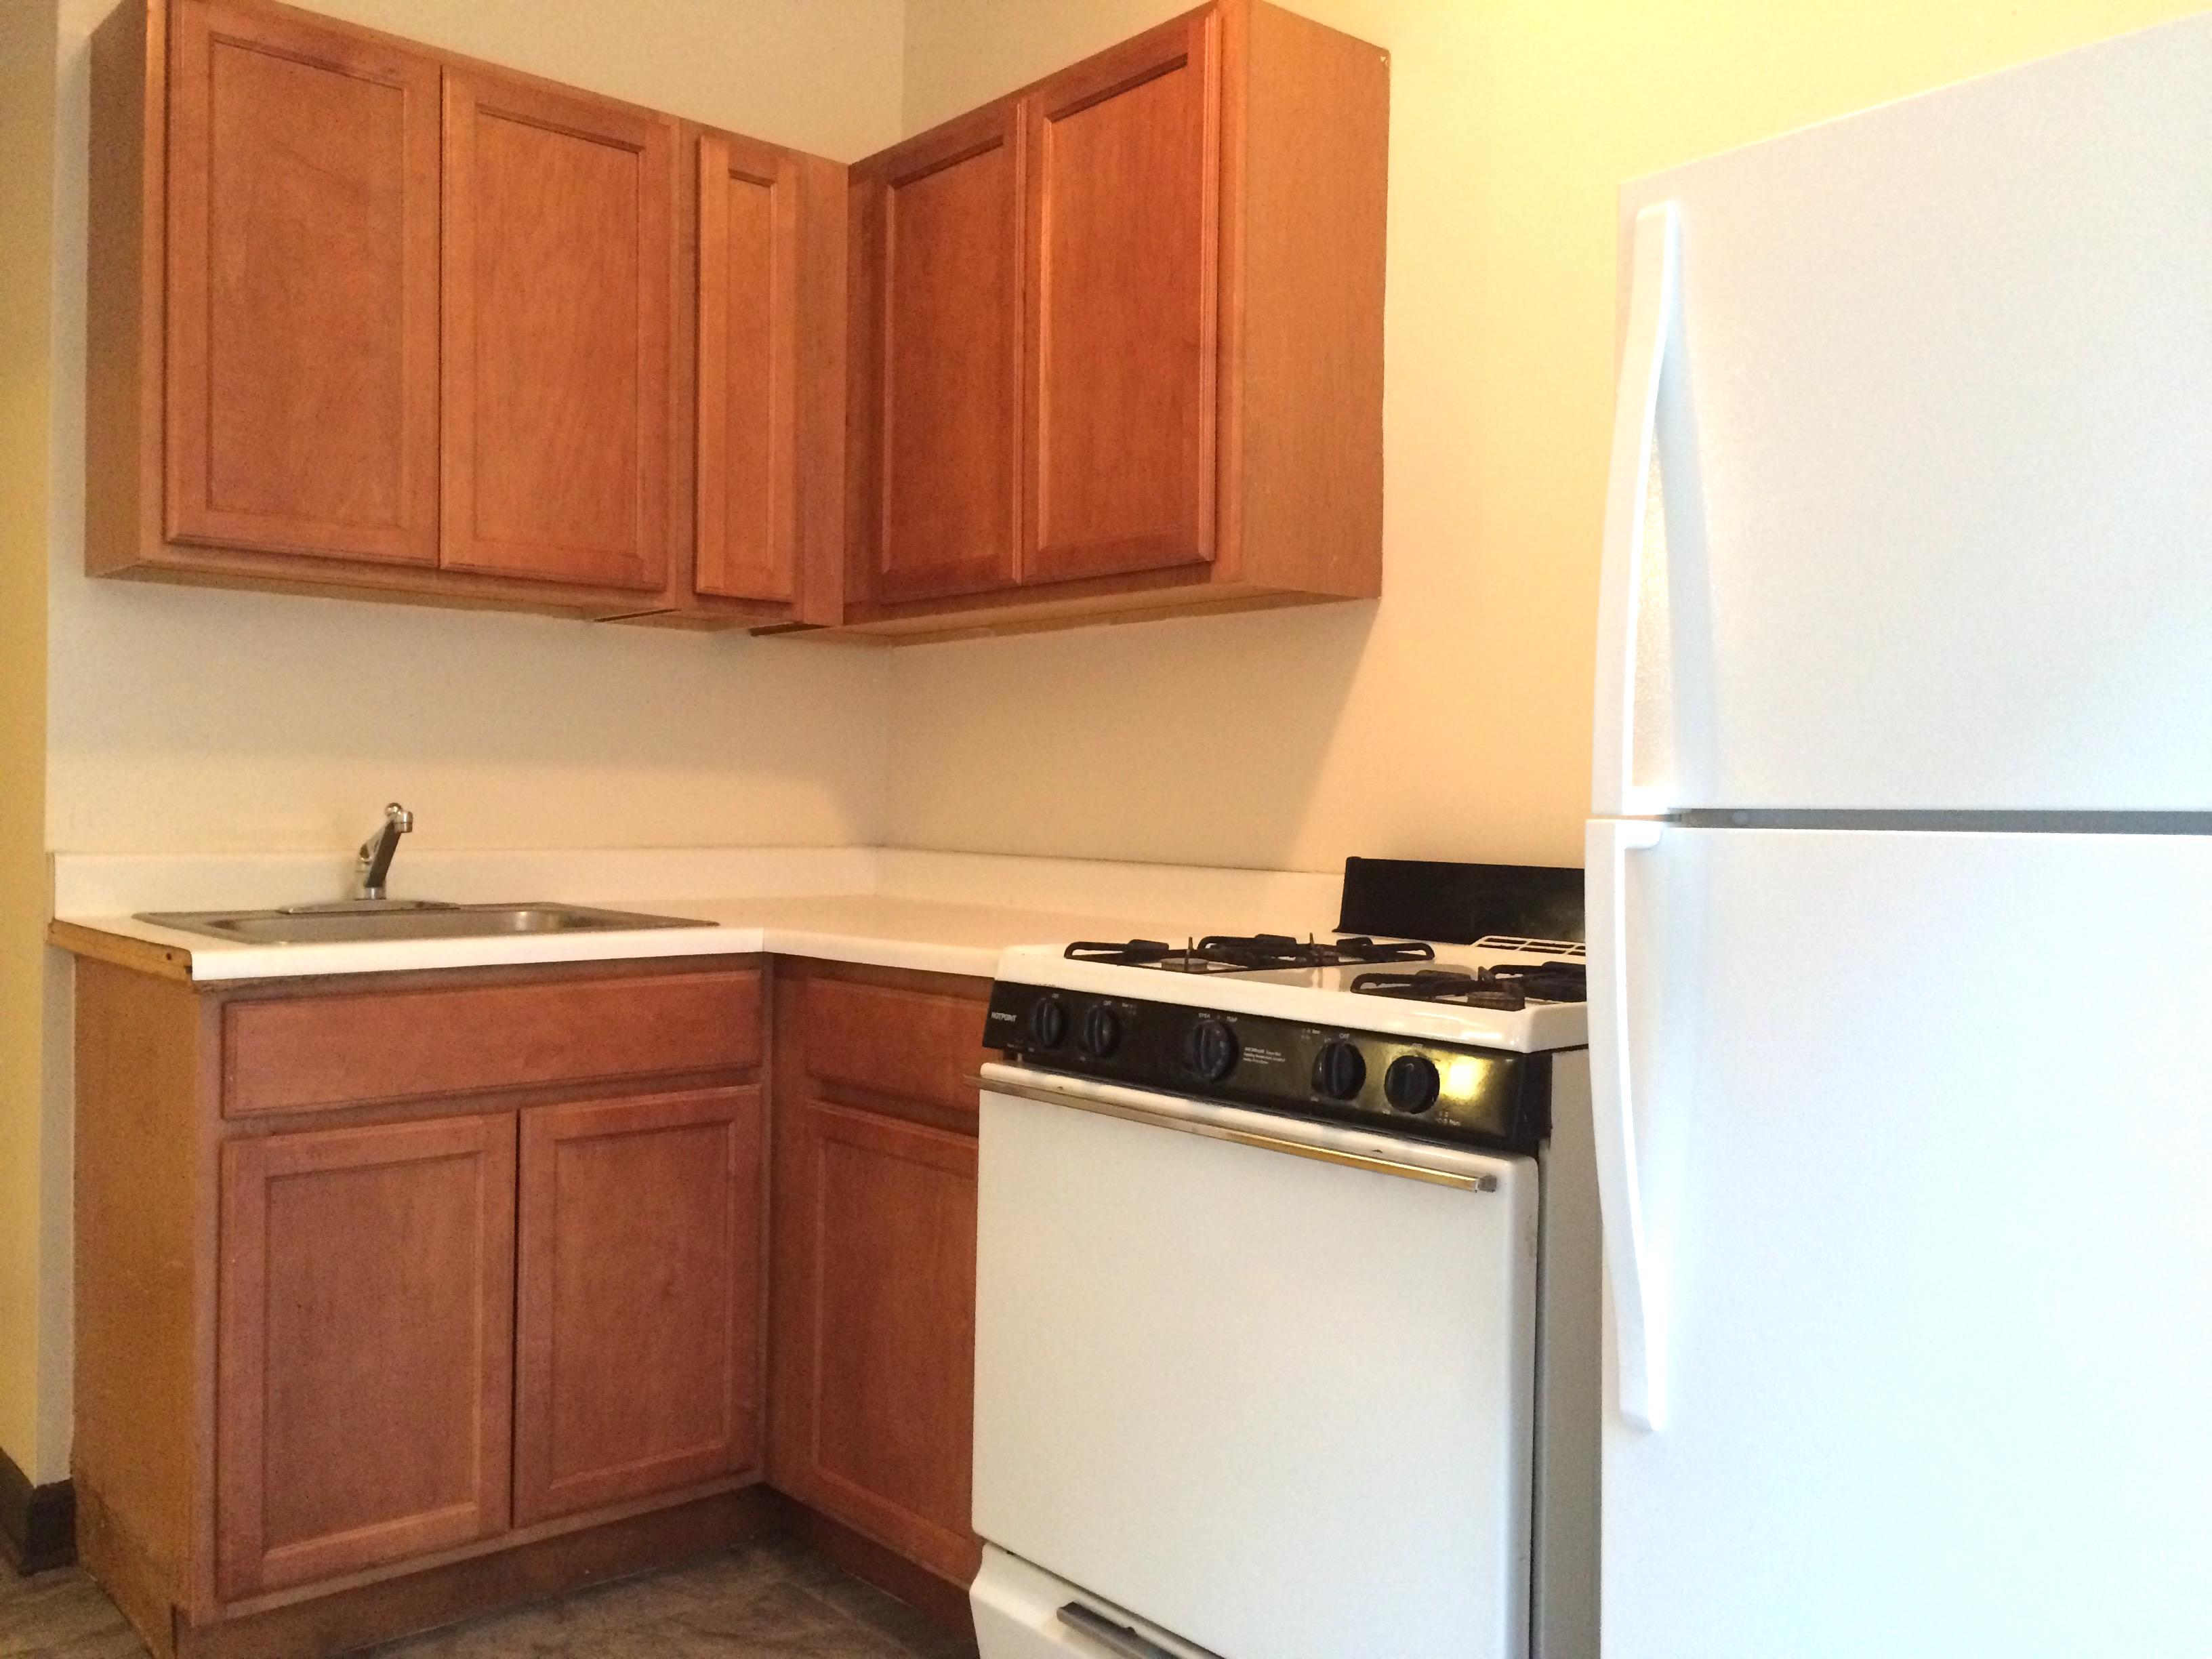 Kitchen, 2 bedroom apartment in Austin Chicago, 335 N Pine, Chicago IL 60644